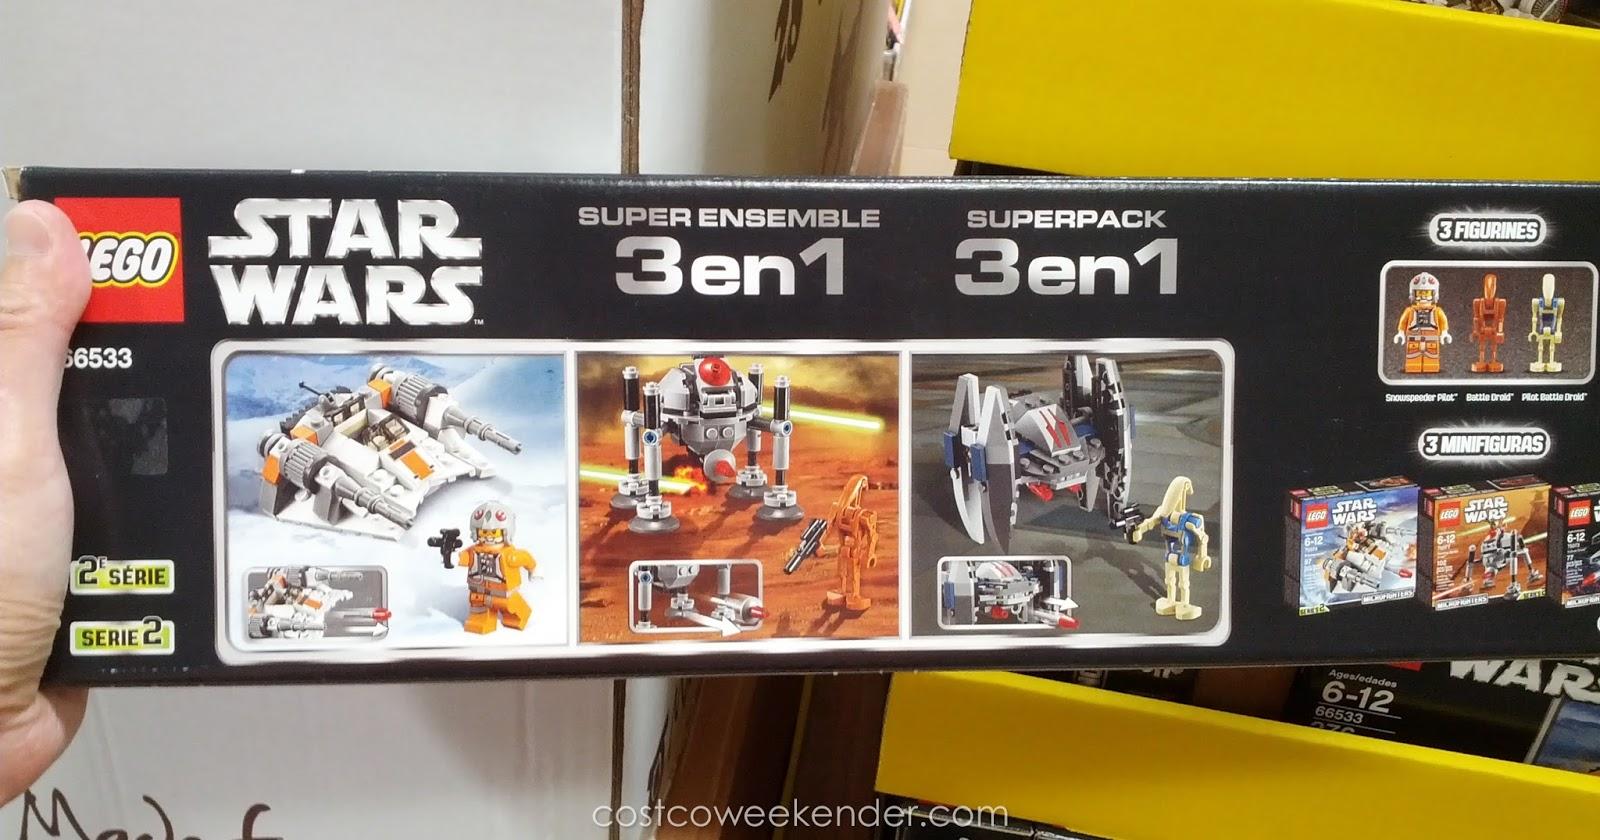 Lego Star Wars Collector 3 In 1 Pack Costco Weekender